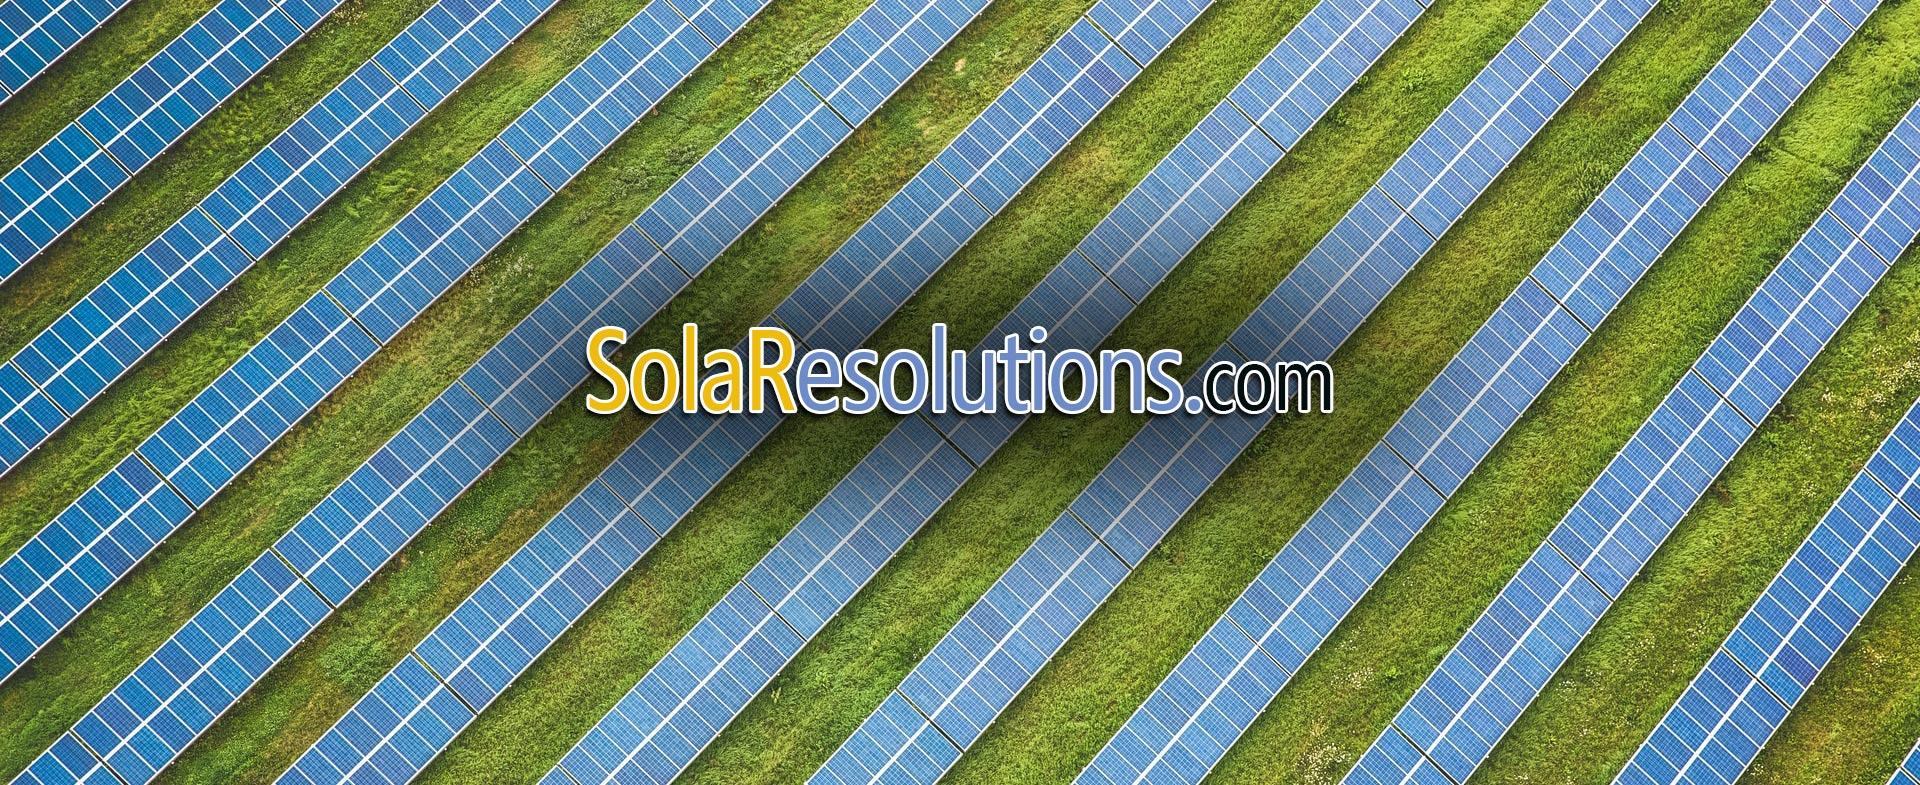 Domain: Solar Resolutions (Dot COM)